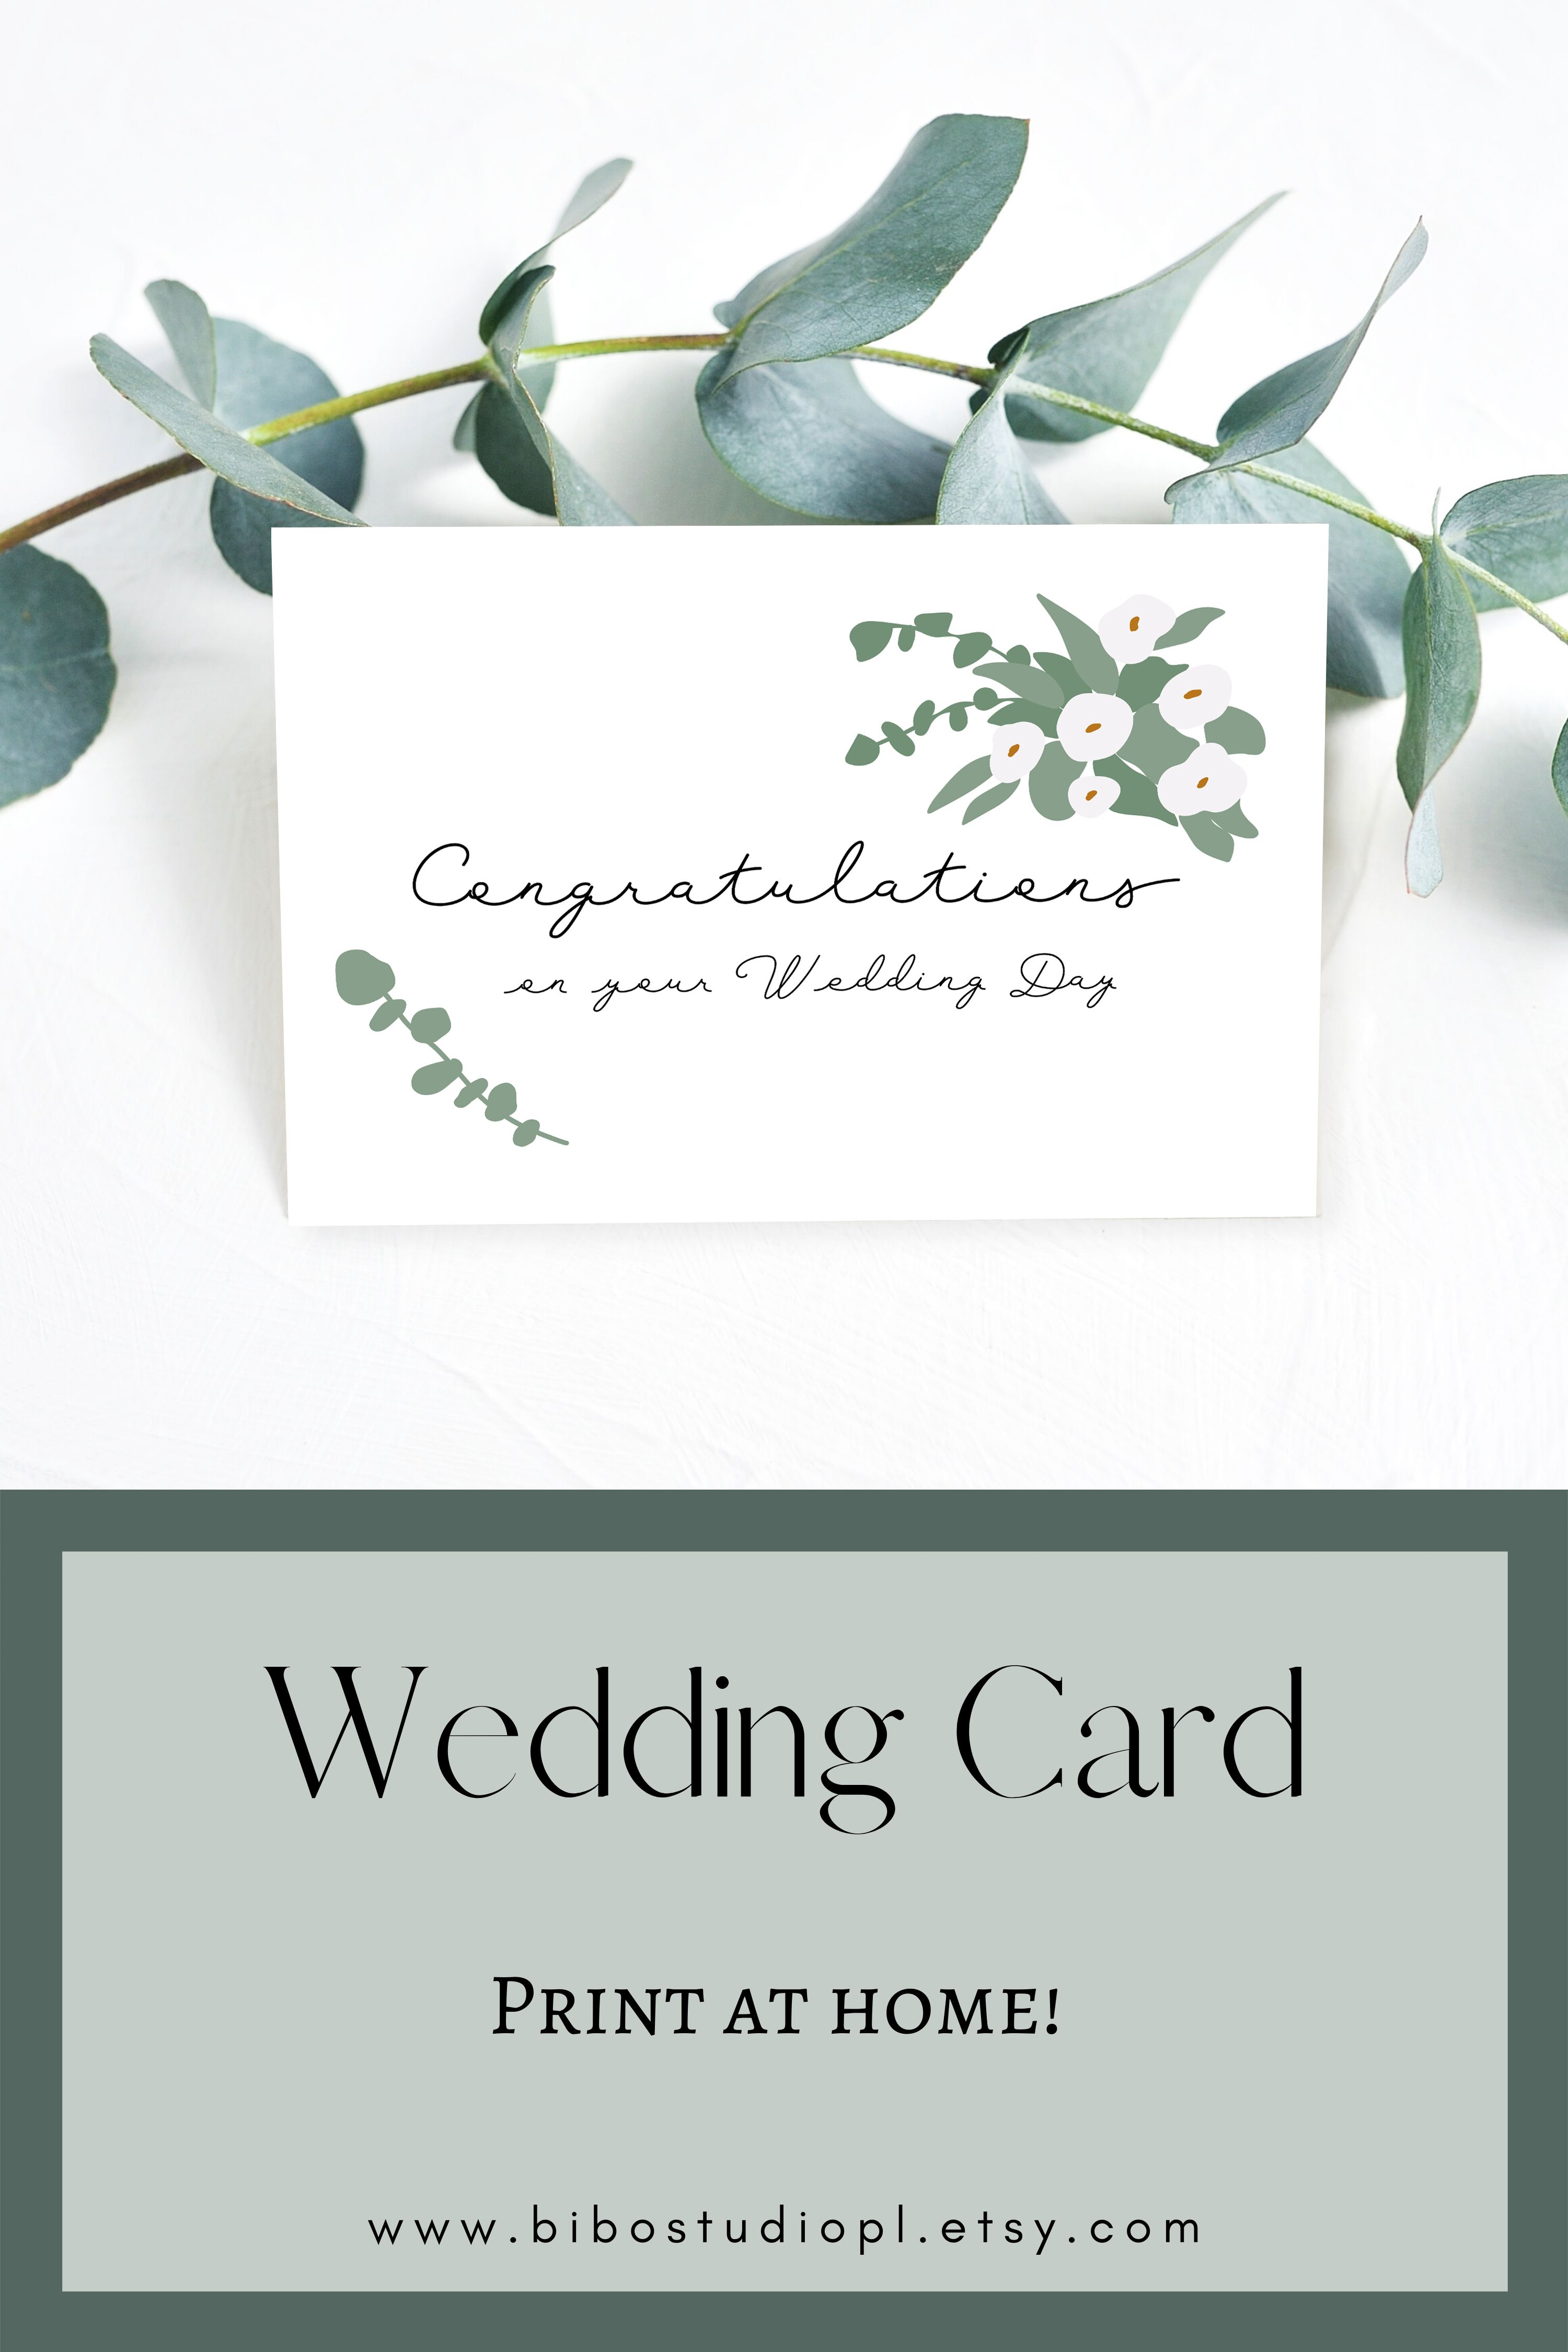 Printable Wedding Card Congratulations Card Instant Download Pdf Us Eu Sizes In 2020 Wedding Congratulations Card Wedding Cards Wedding Greeting Cards